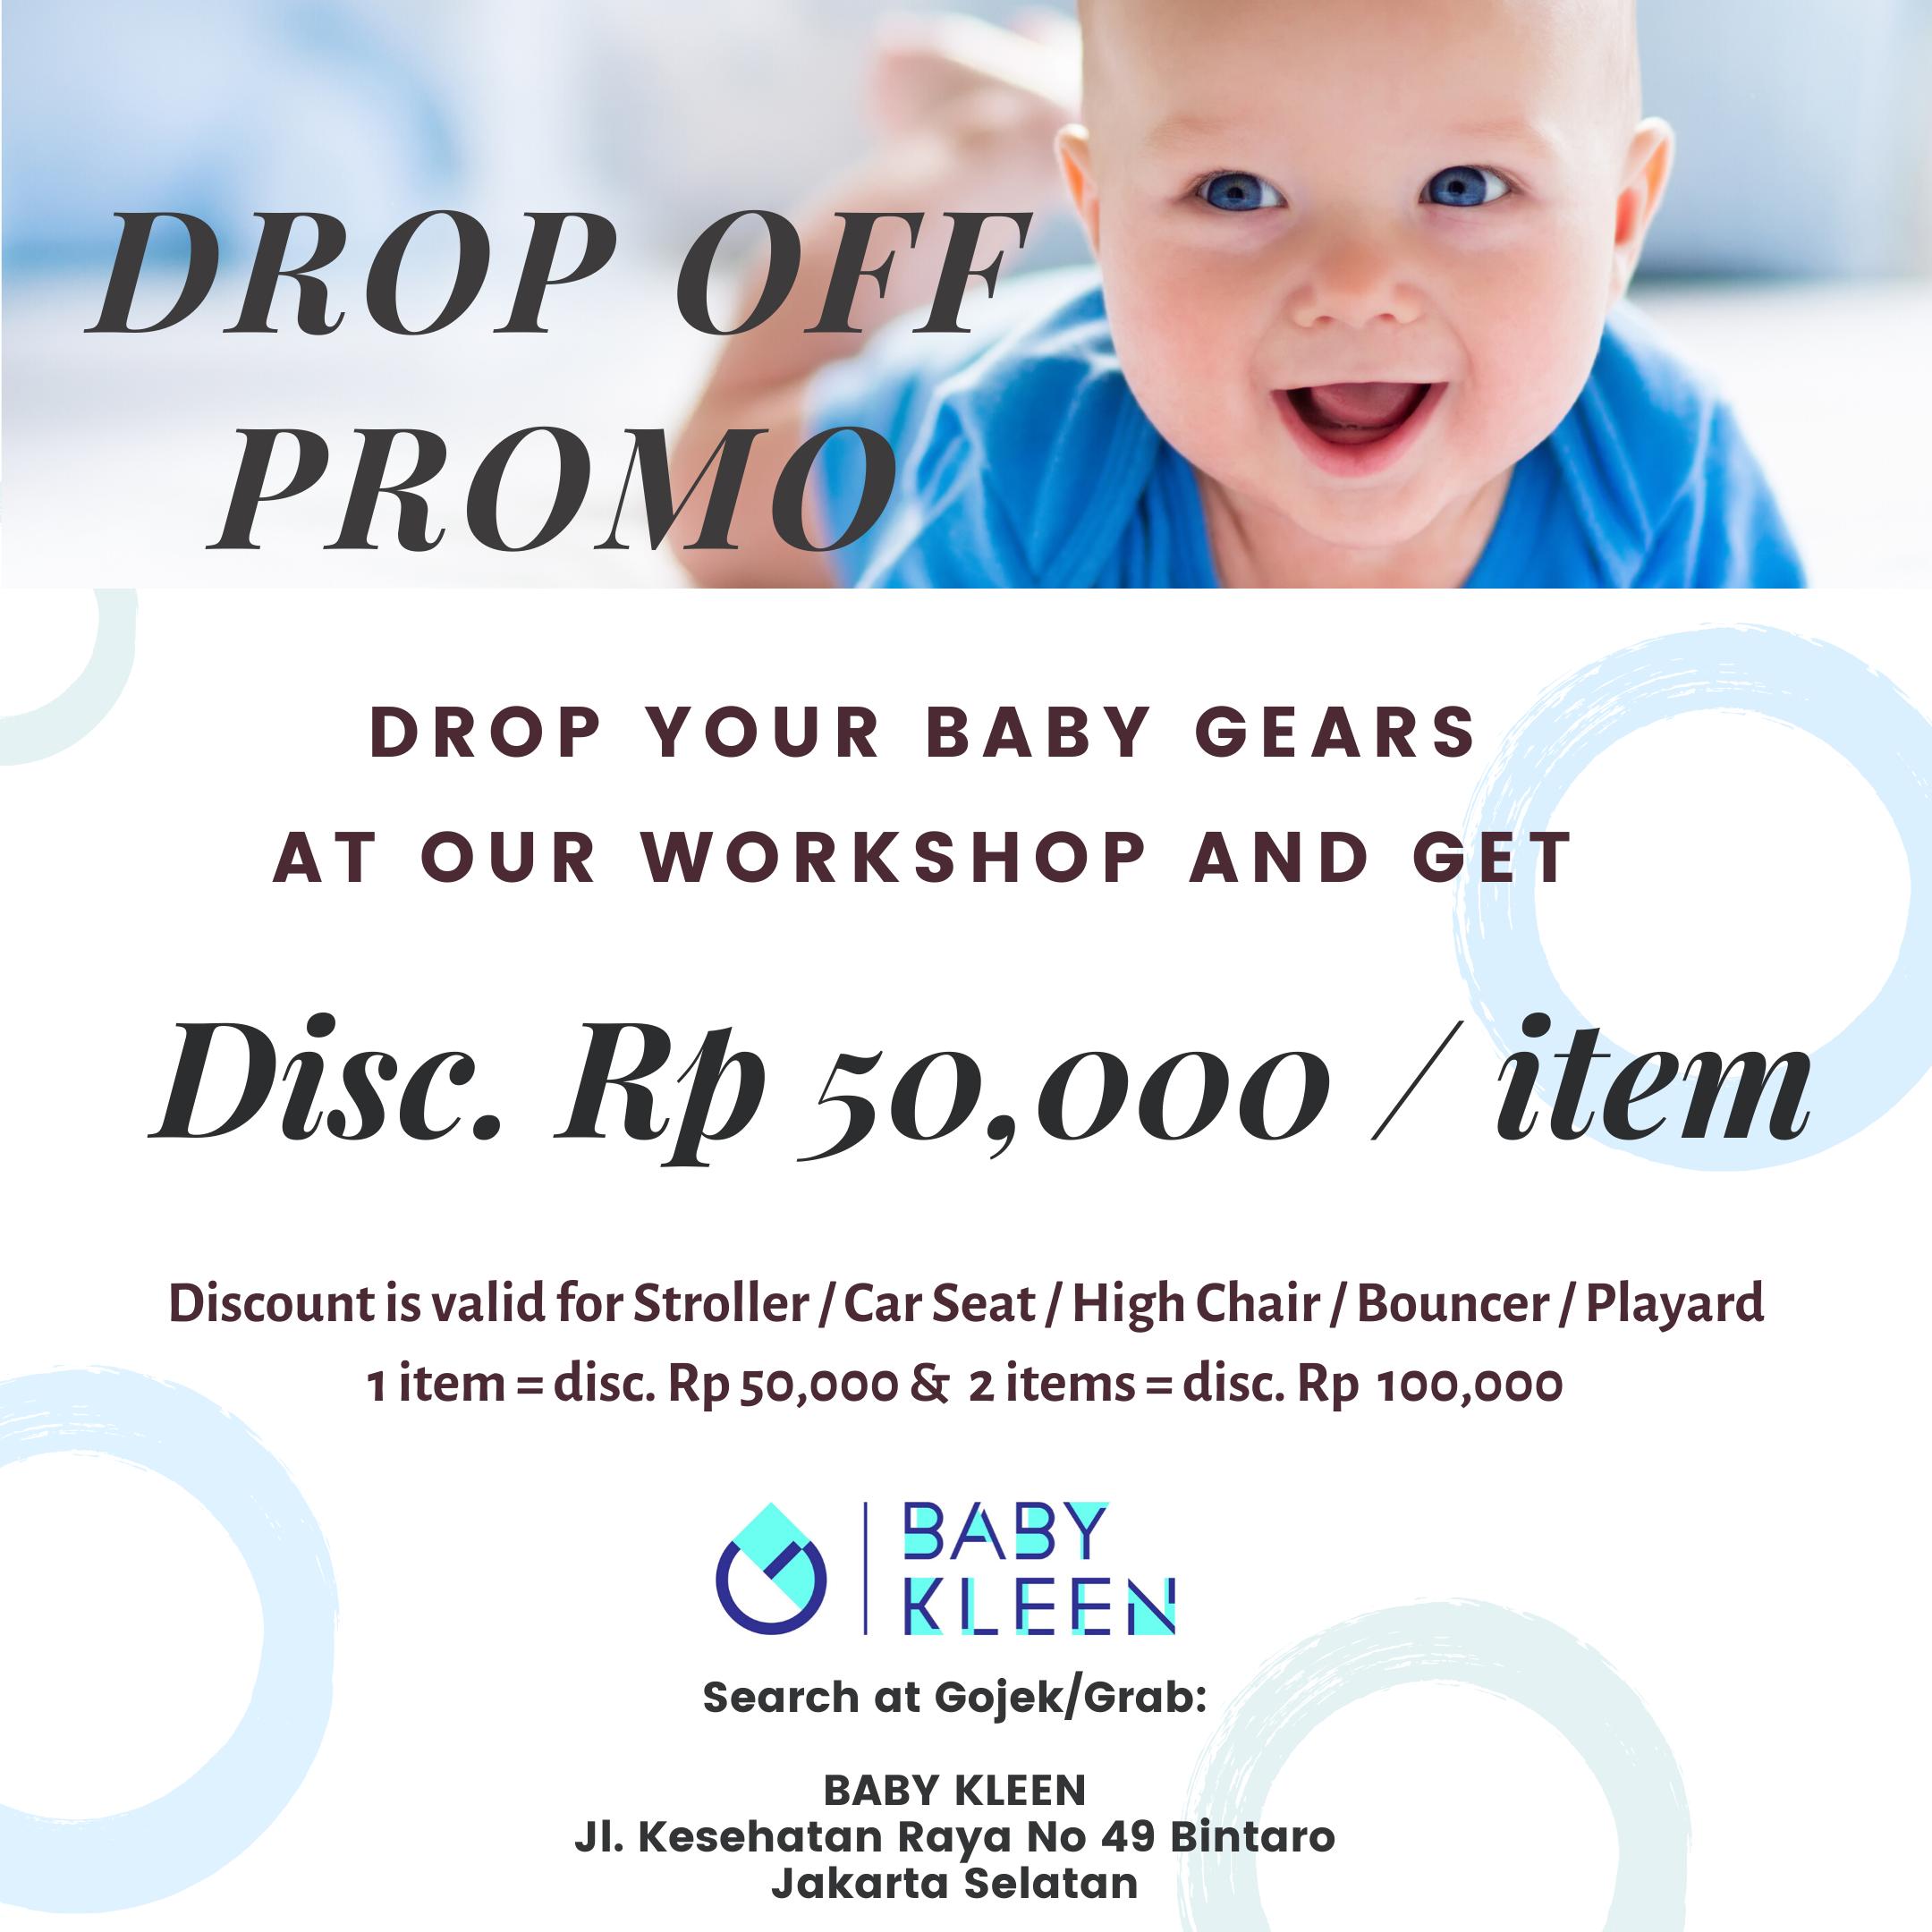 Drop Off Promo